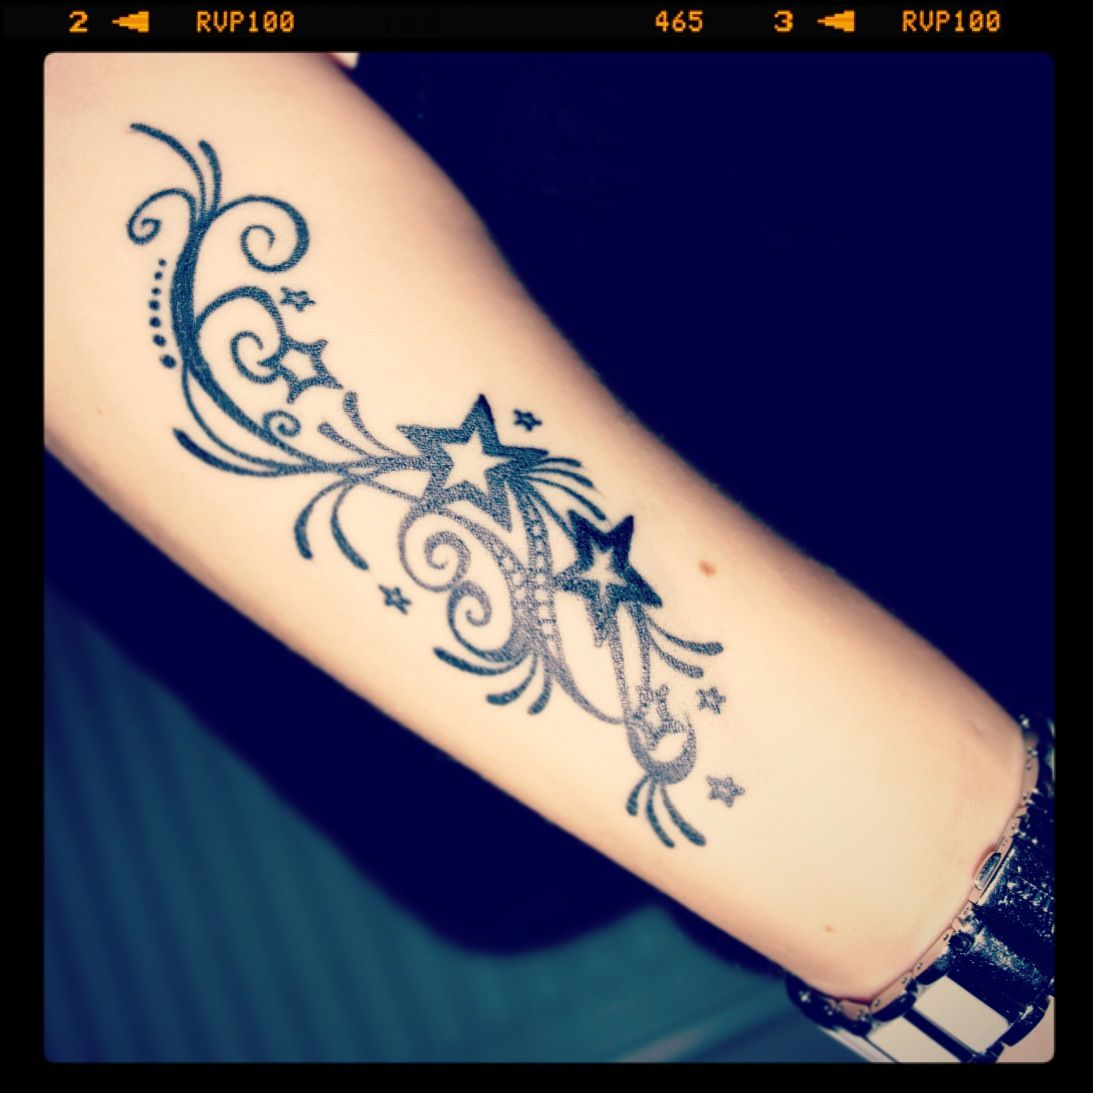 Forearm Tattoo Stars Inspirational Tattoos Forearm Tattoo Star Tattoos